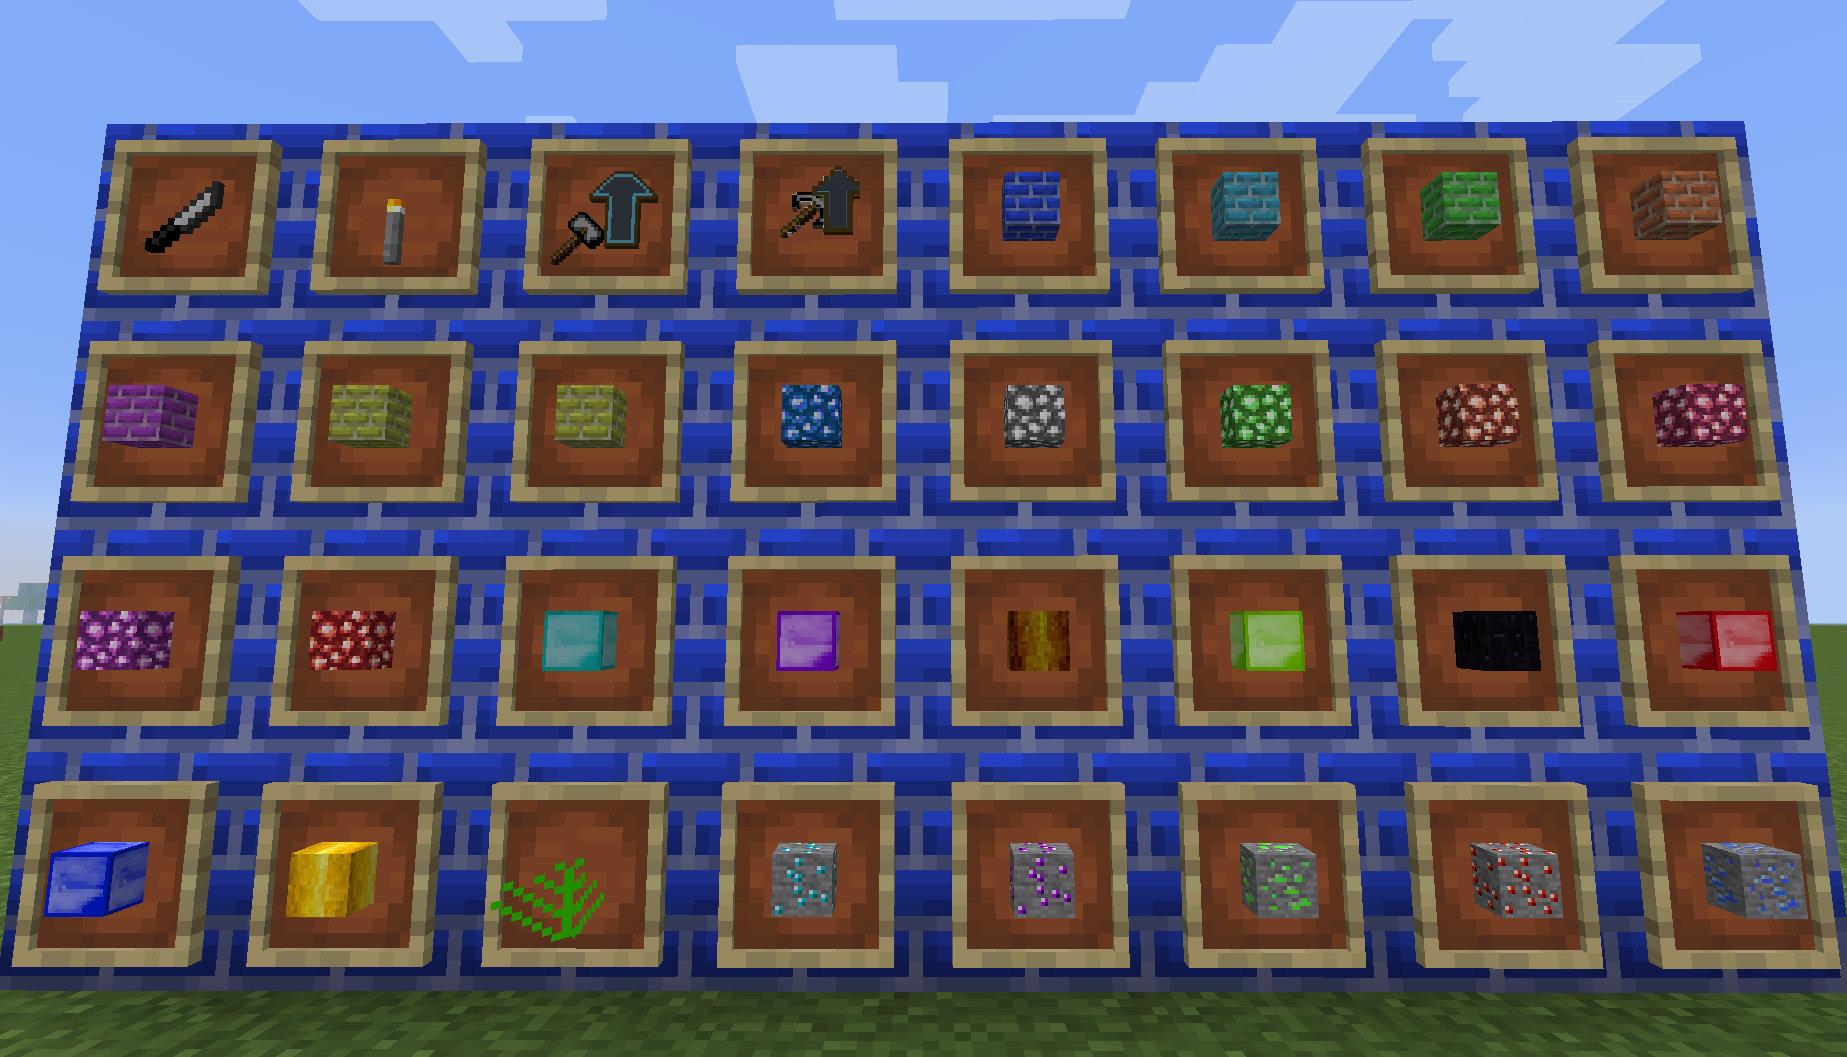 Crops, Items, & Blocks